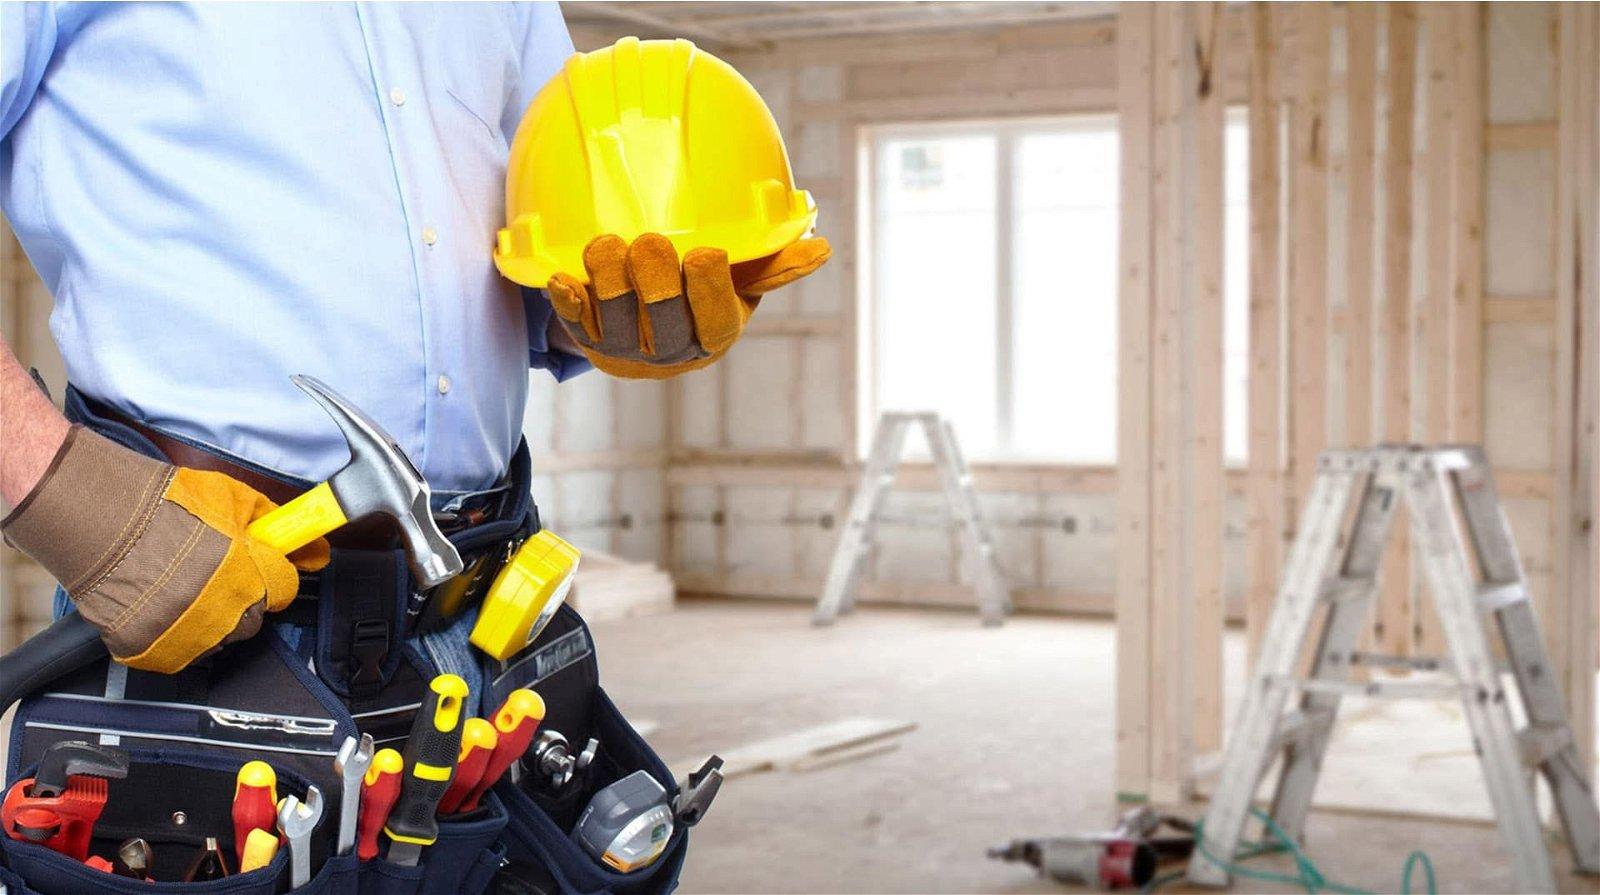 st. augustine renovation mortgage, st. augustine remodel mortgage, st. augustine renovation loan, st. augustine mortgage